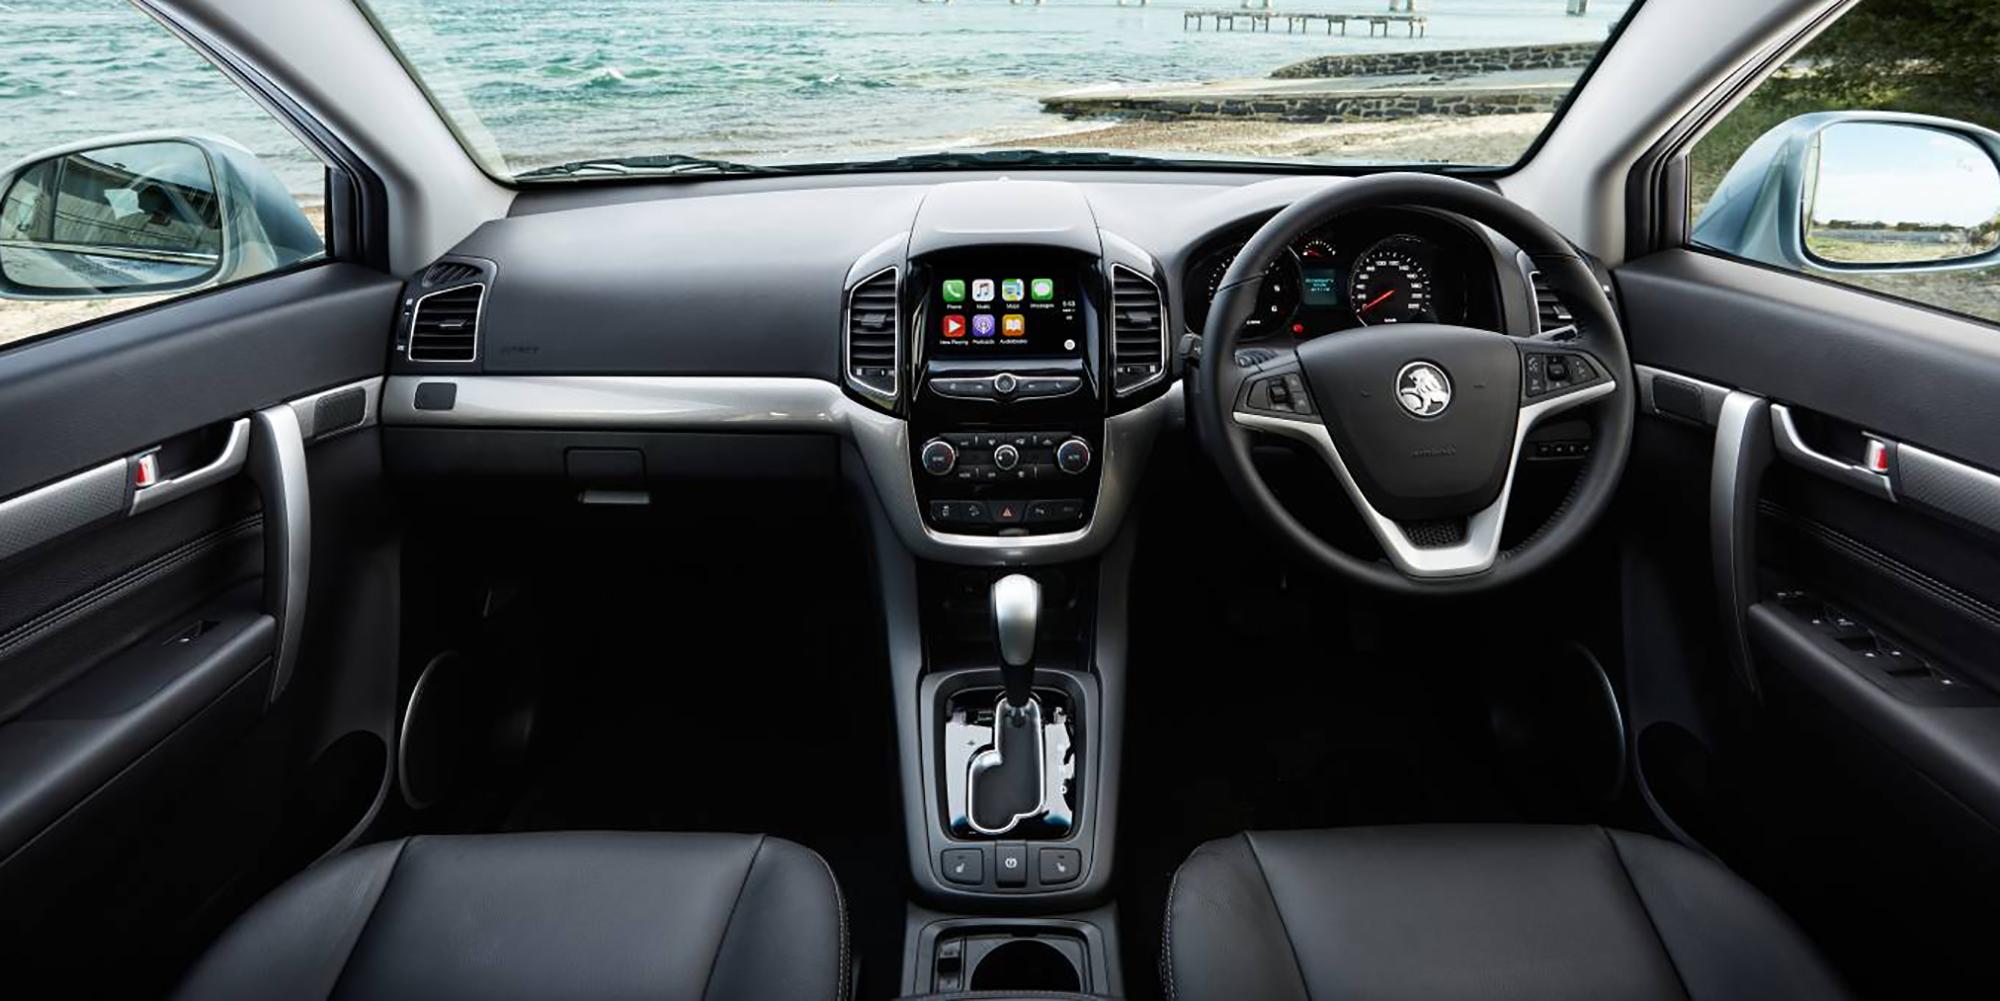 2018 Holden Captiva updates announced - Photos